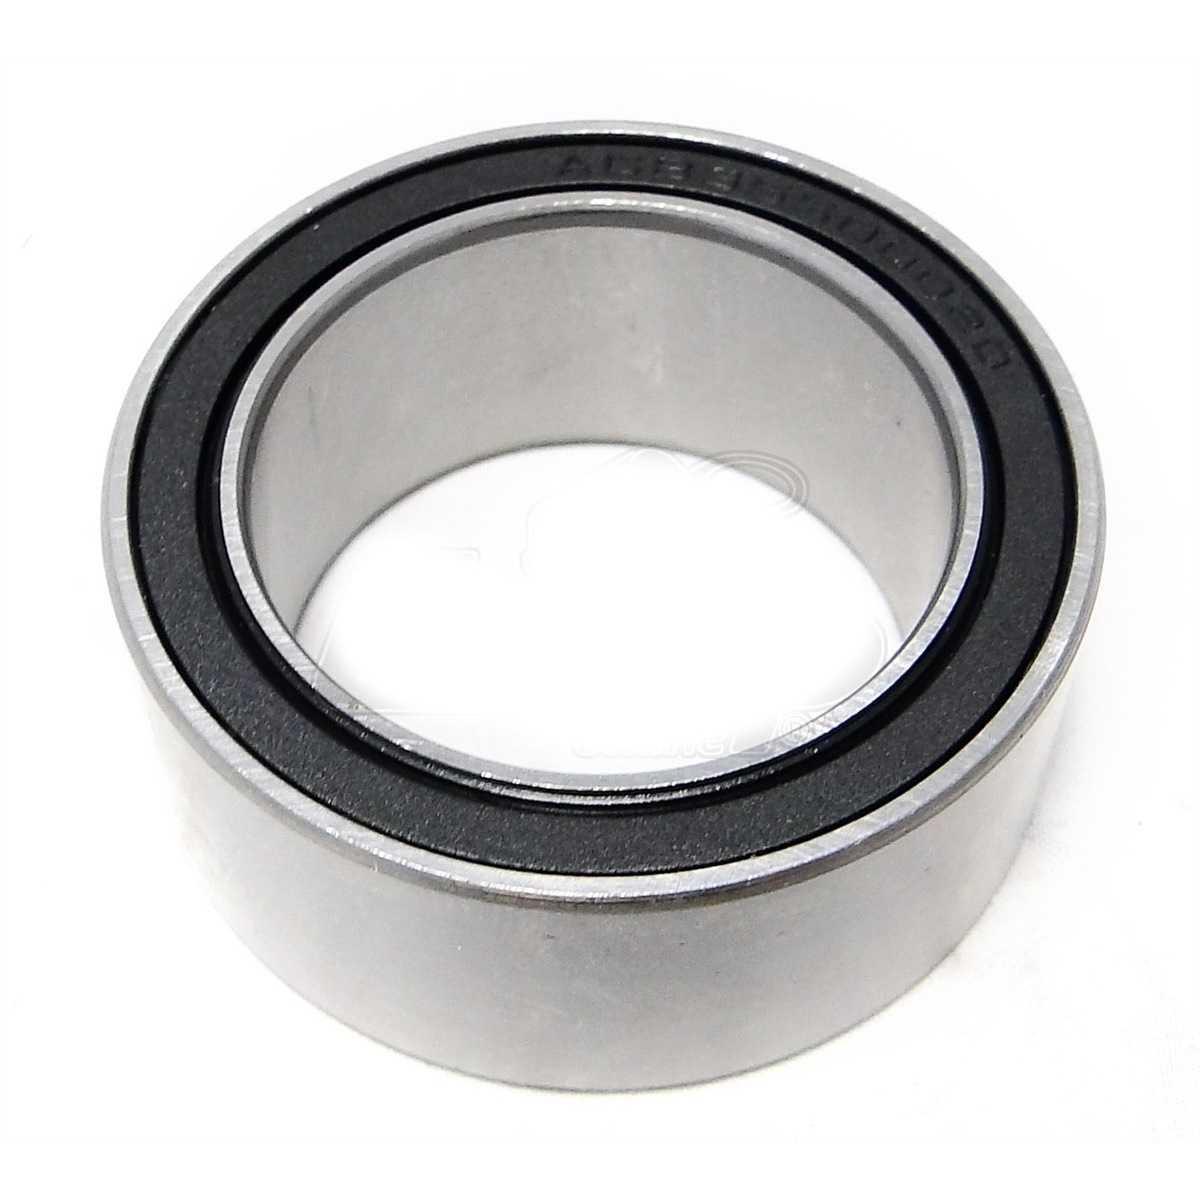 Rolamento - Palio Calsonic/Onix/Cobalt/Spin  32X47X18